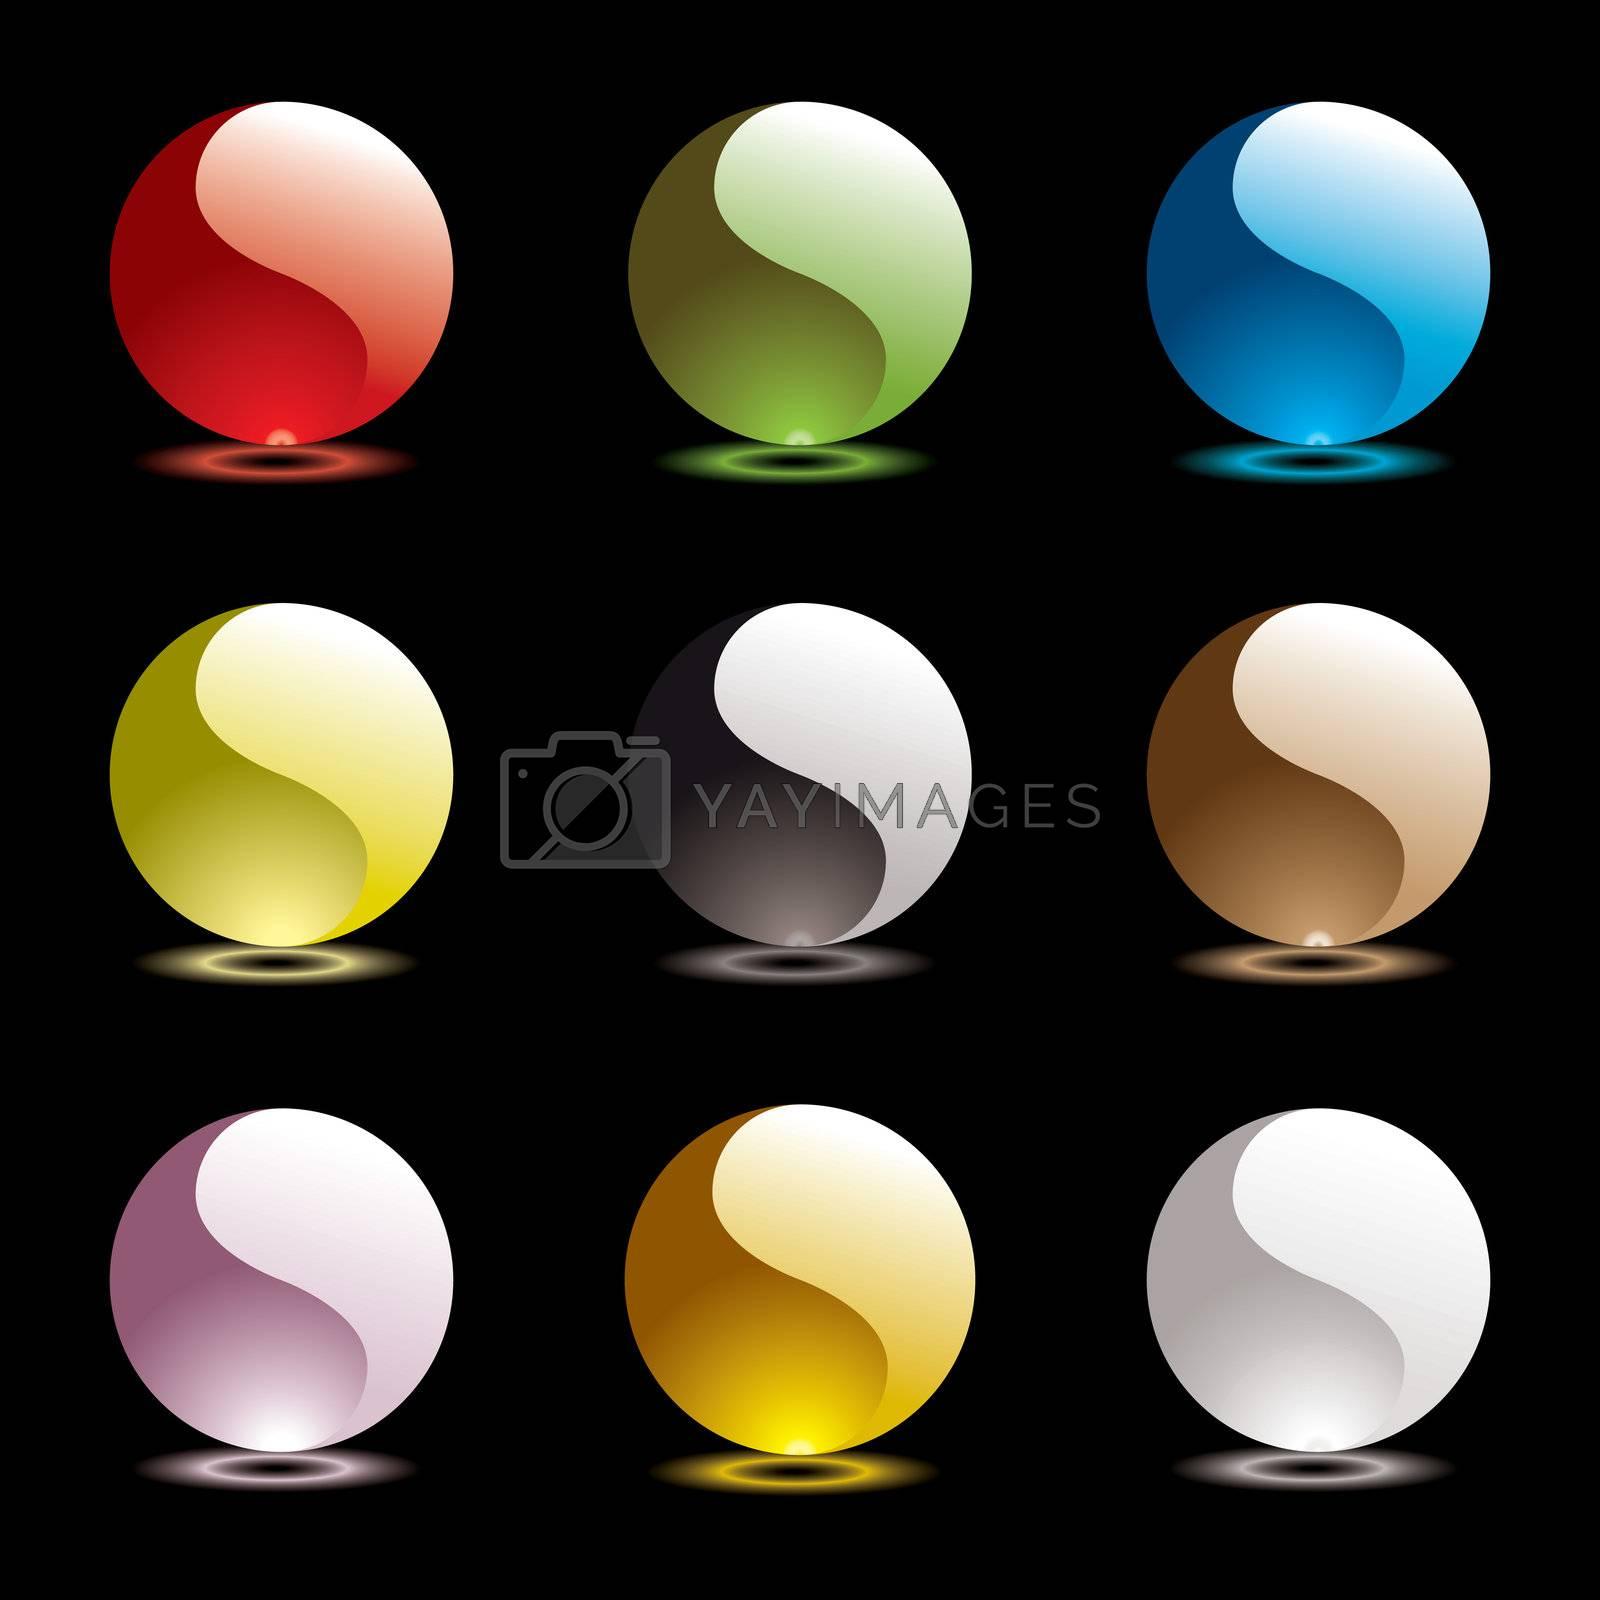 Royalty free image of gel round ying yang by nicemonkey